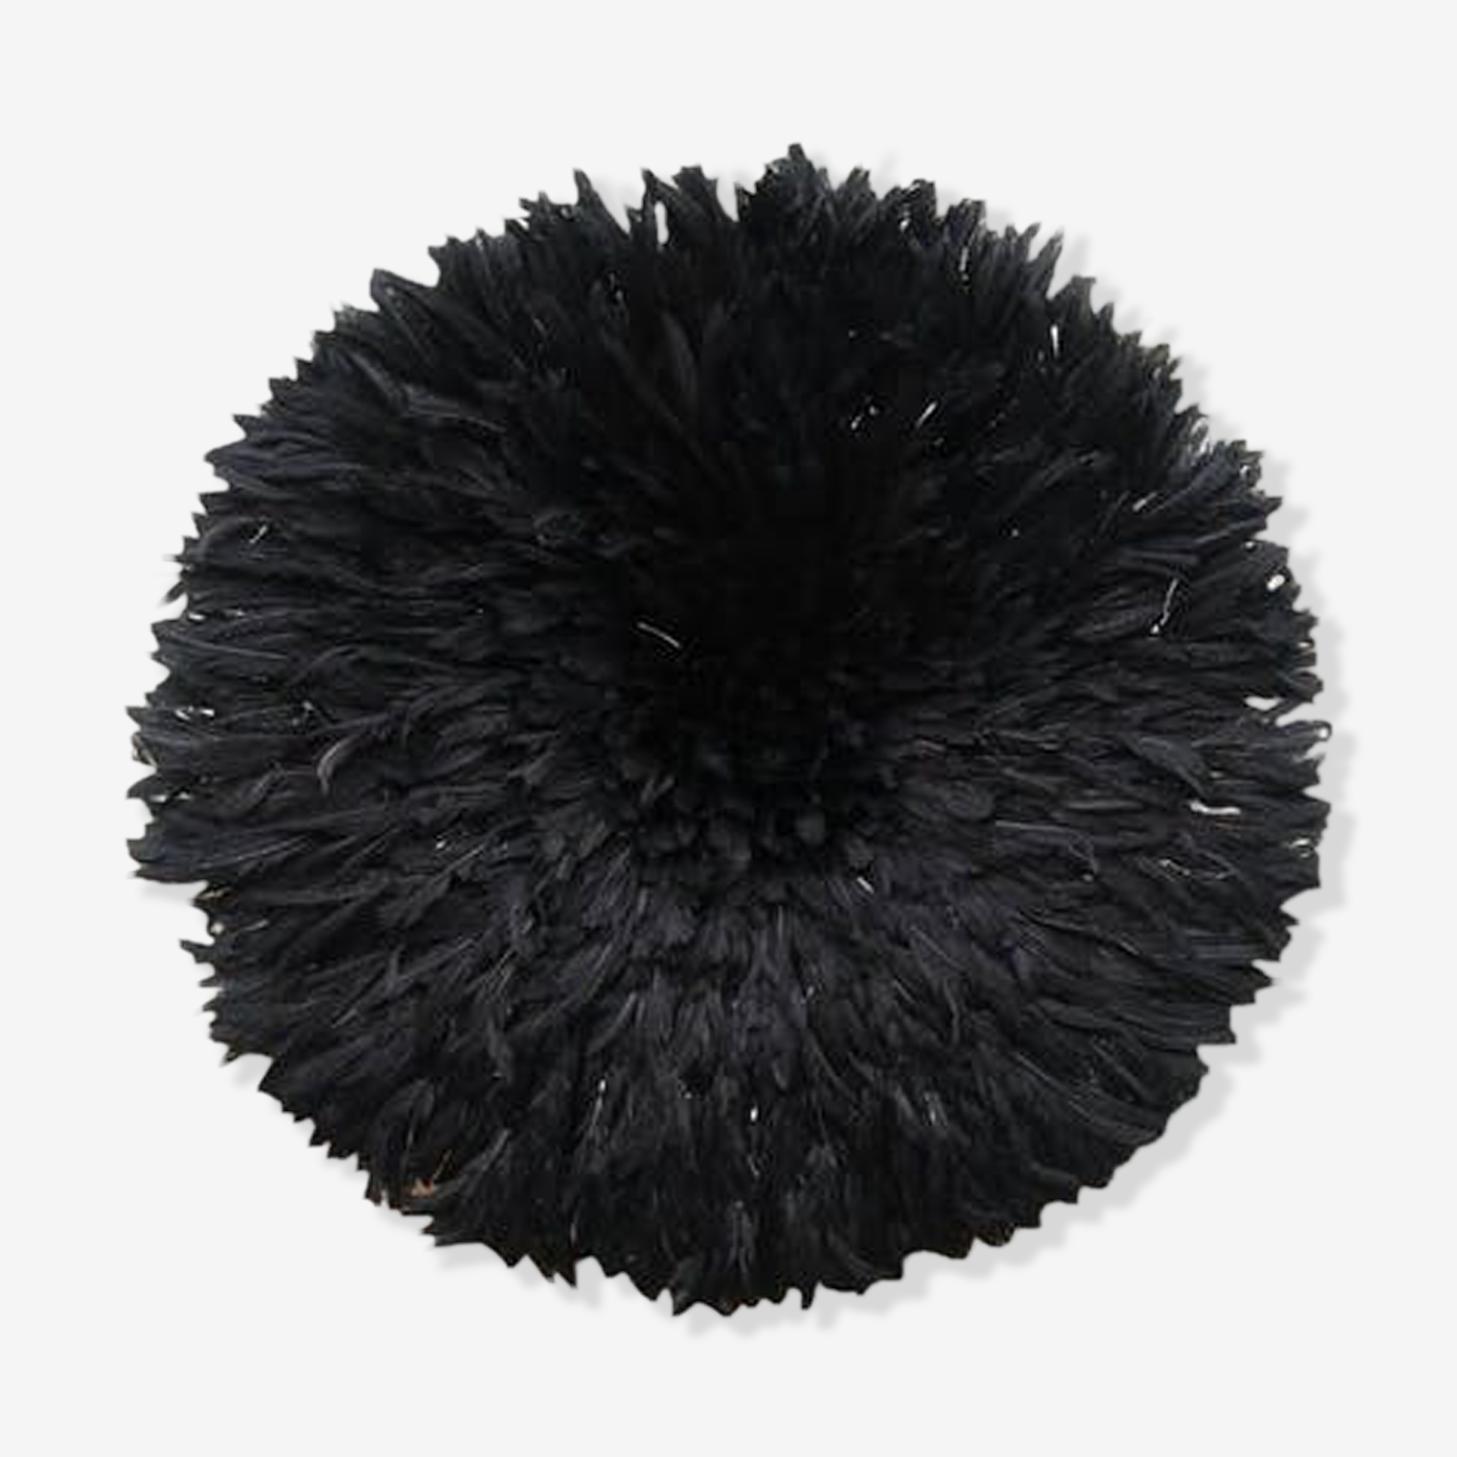 Juju hat noir 75cm